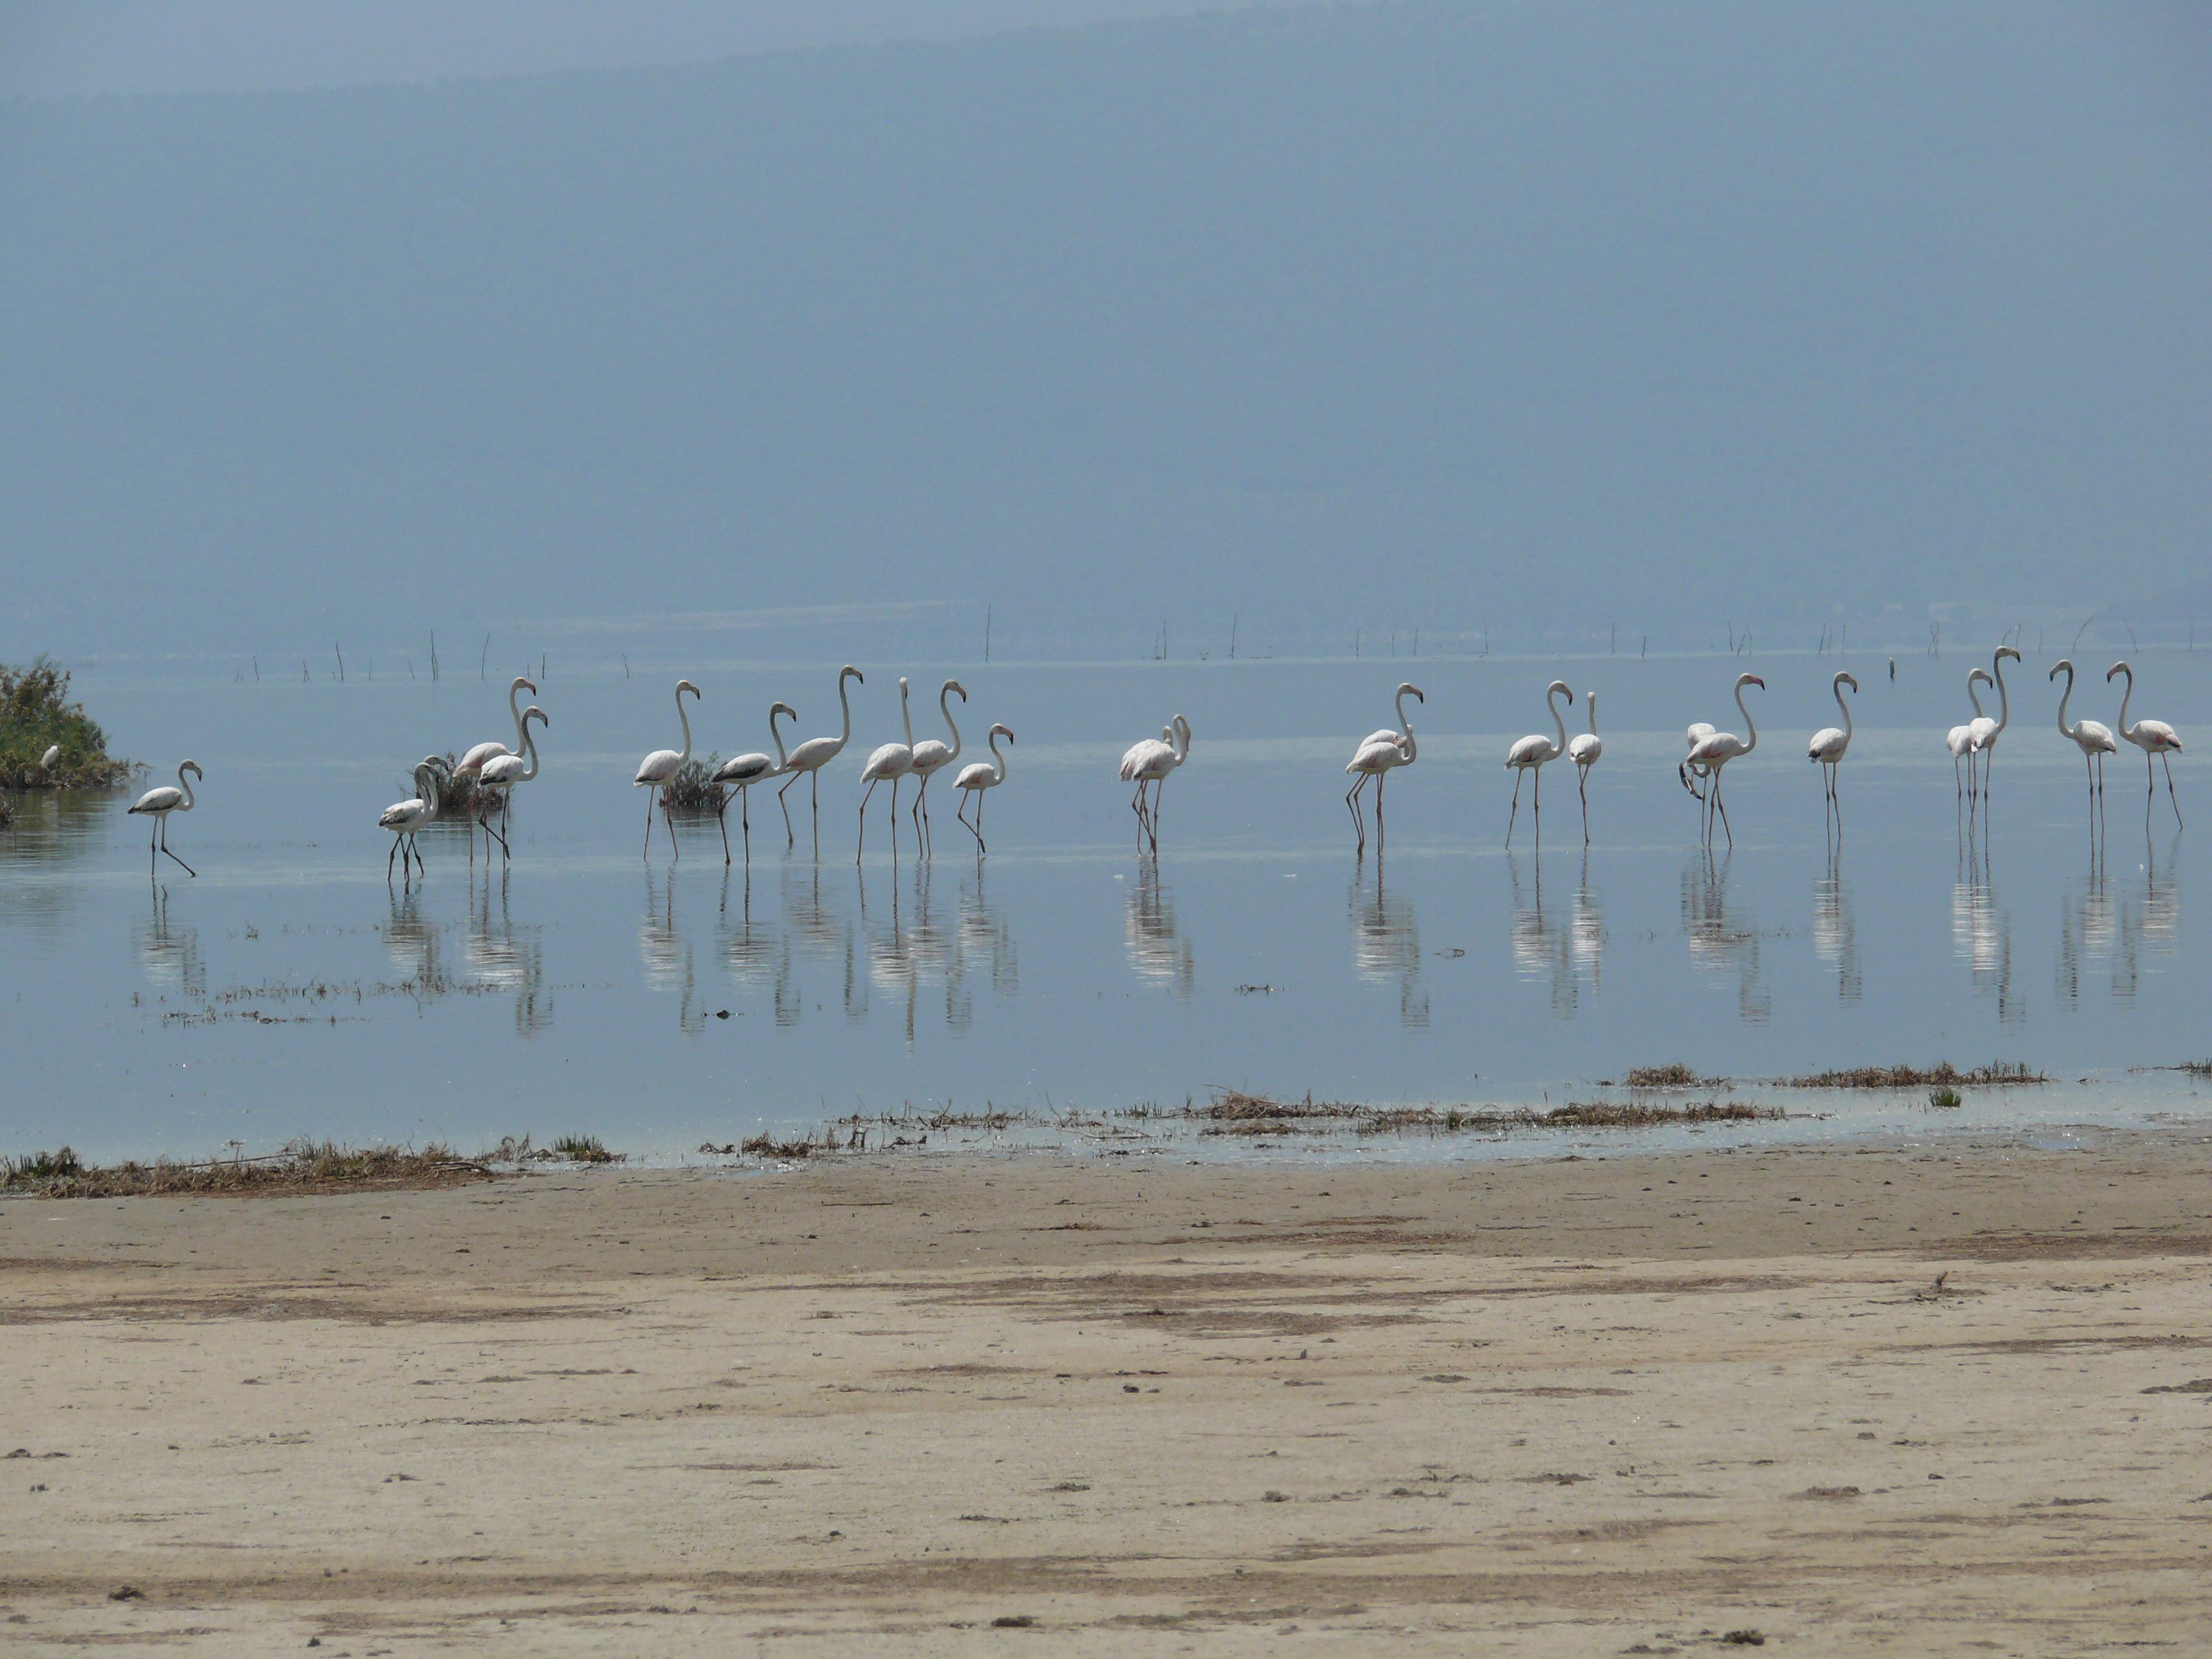 Flamingos in Sercin